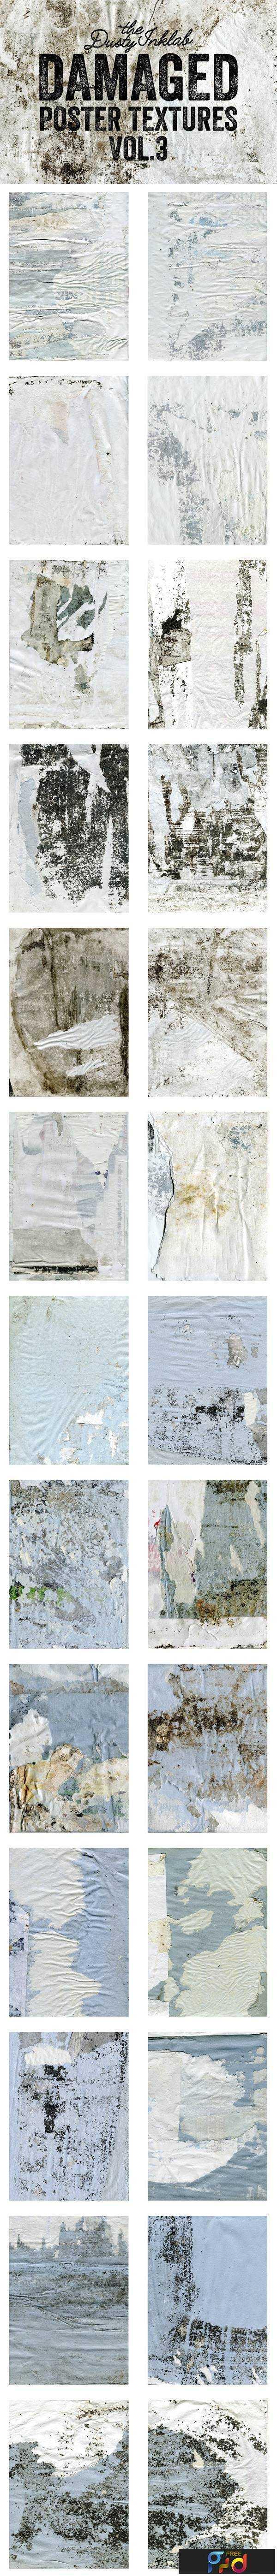 1805236 Damaged Poster Textures Vol. 3 2027238 1